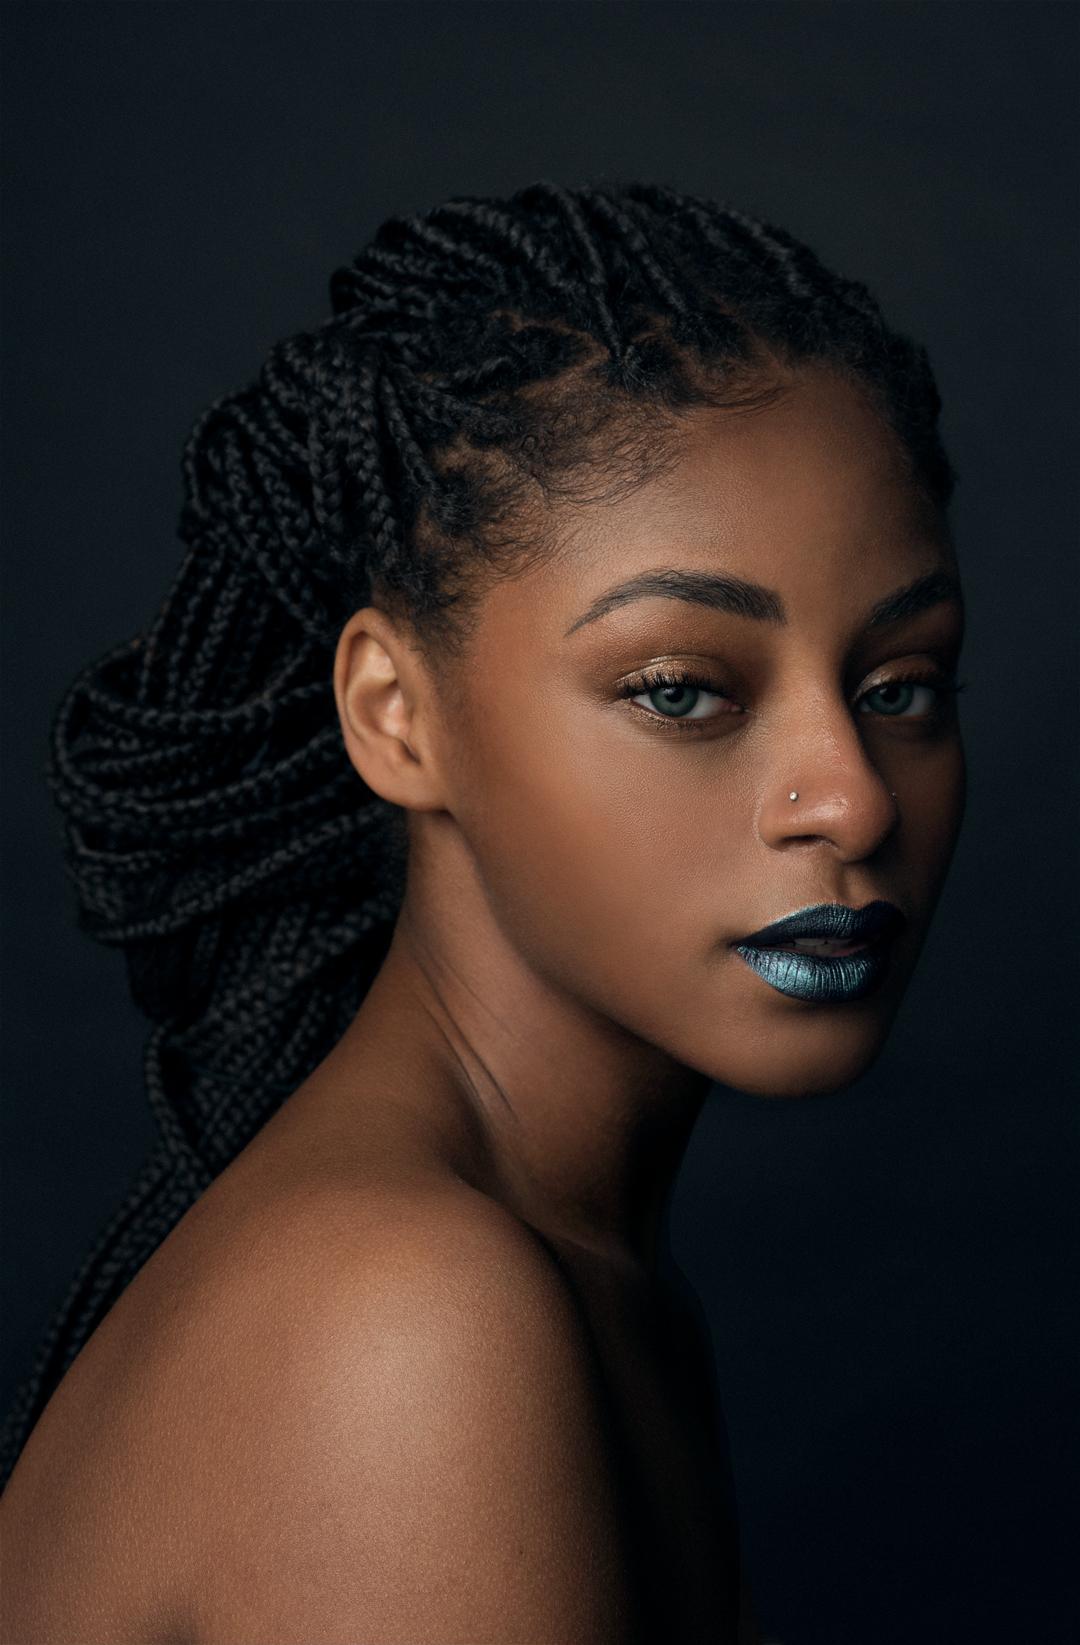 beauty, fotografía, retrato, modelo